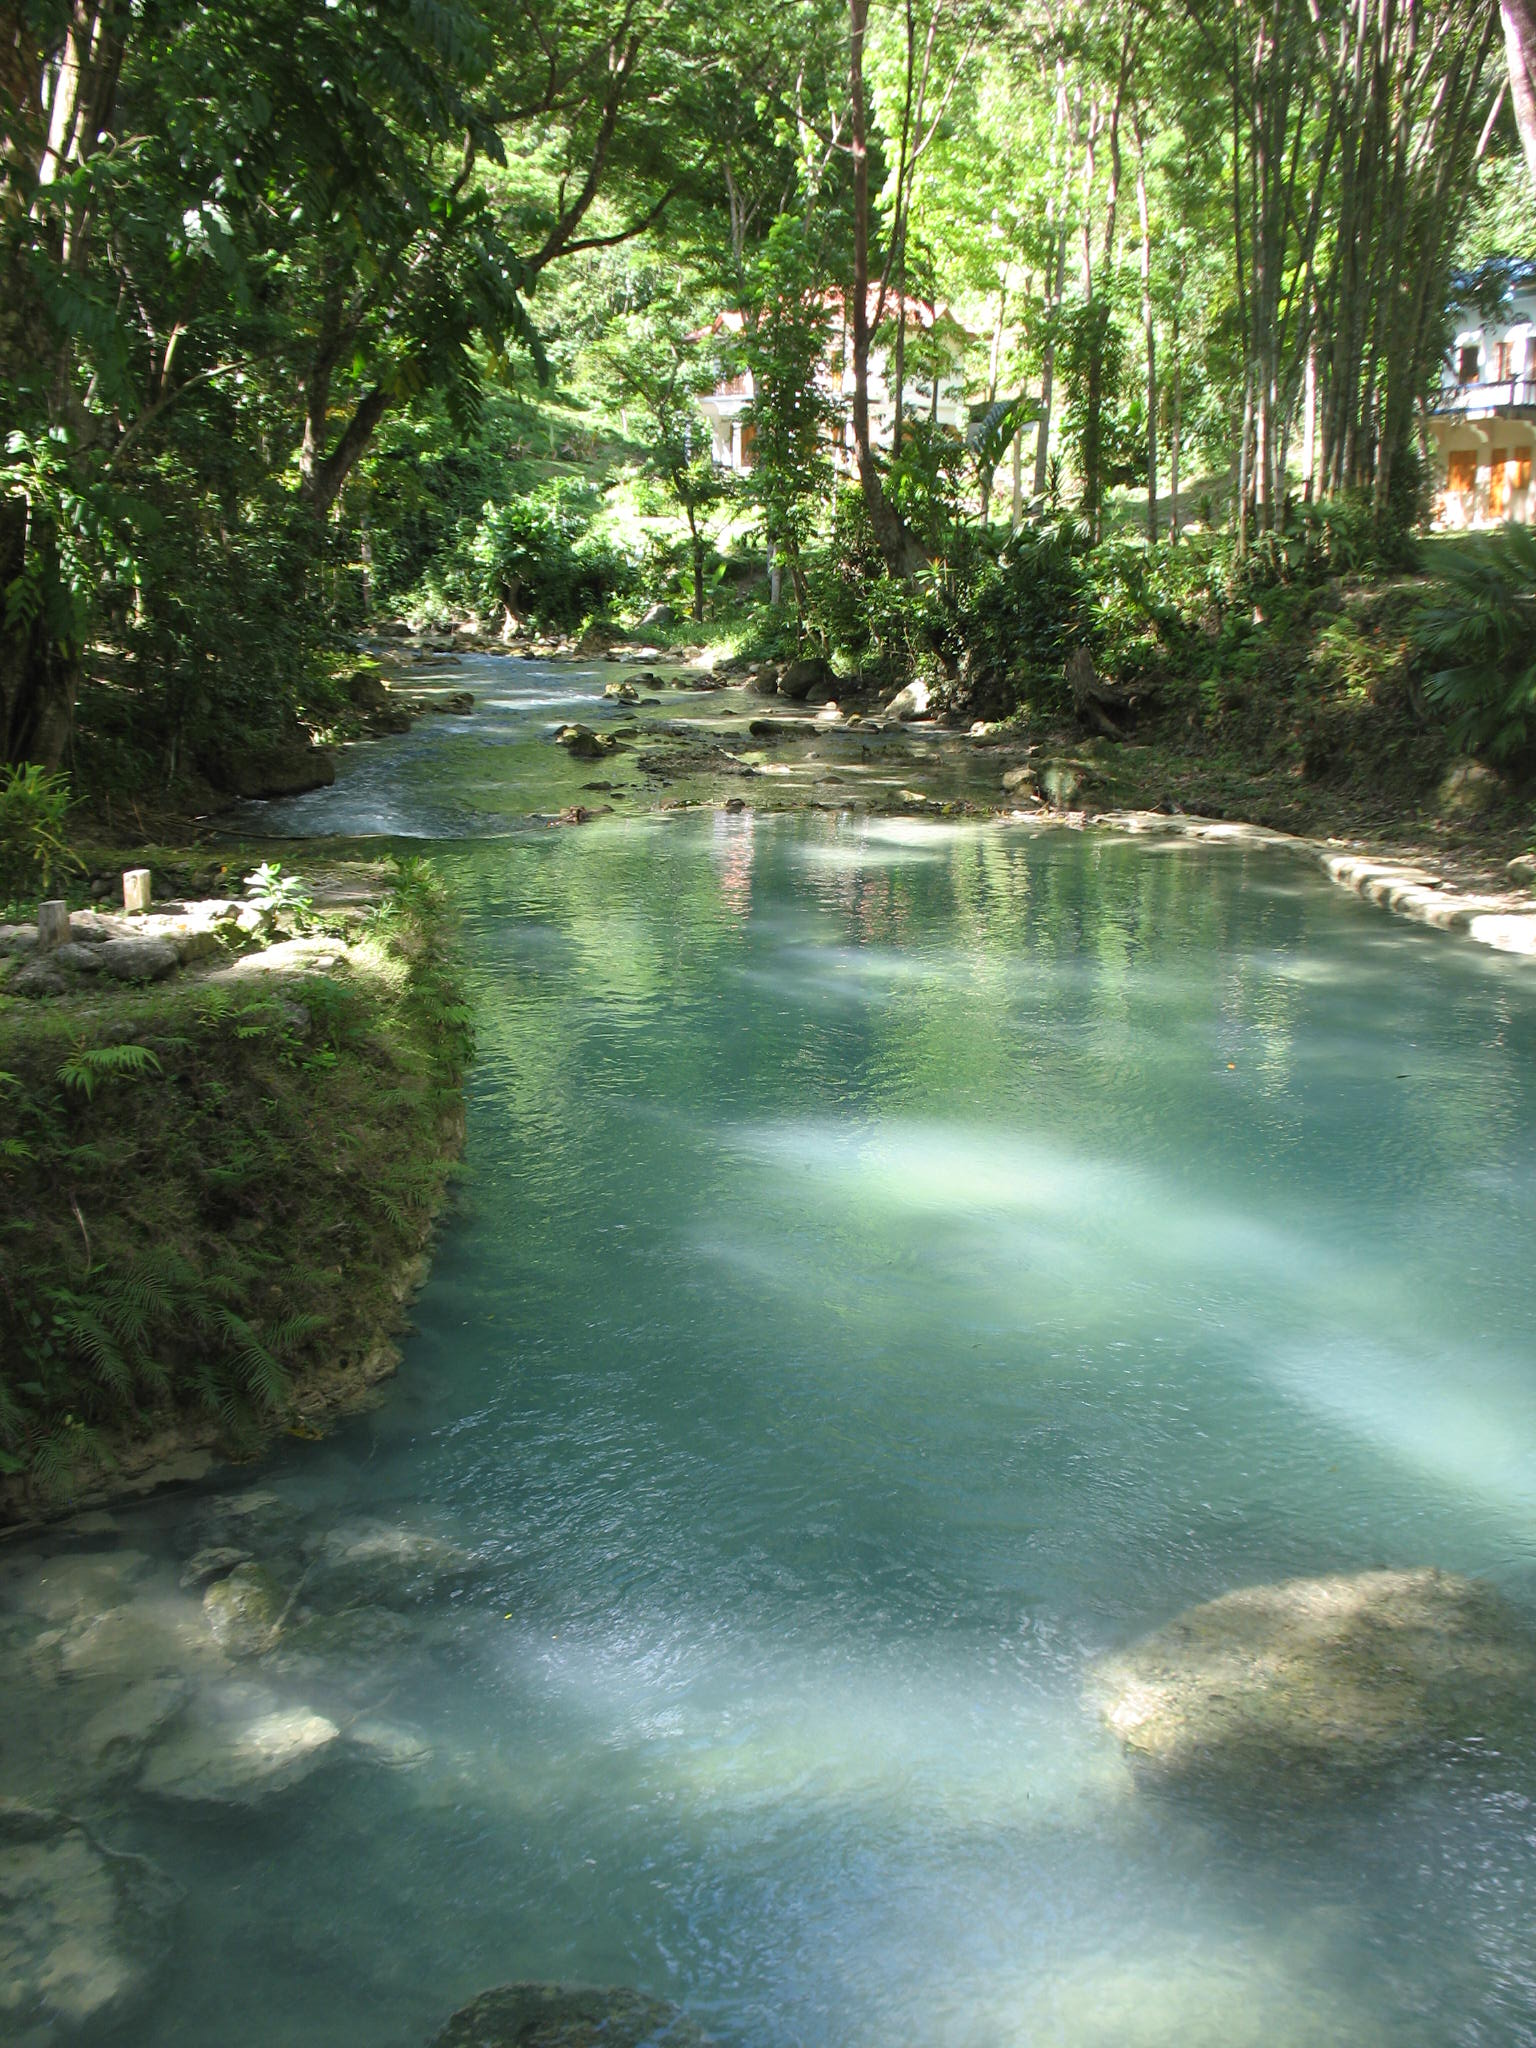 FileKawasan River Cebu PhilippinesJPG  Wikimedia Commons